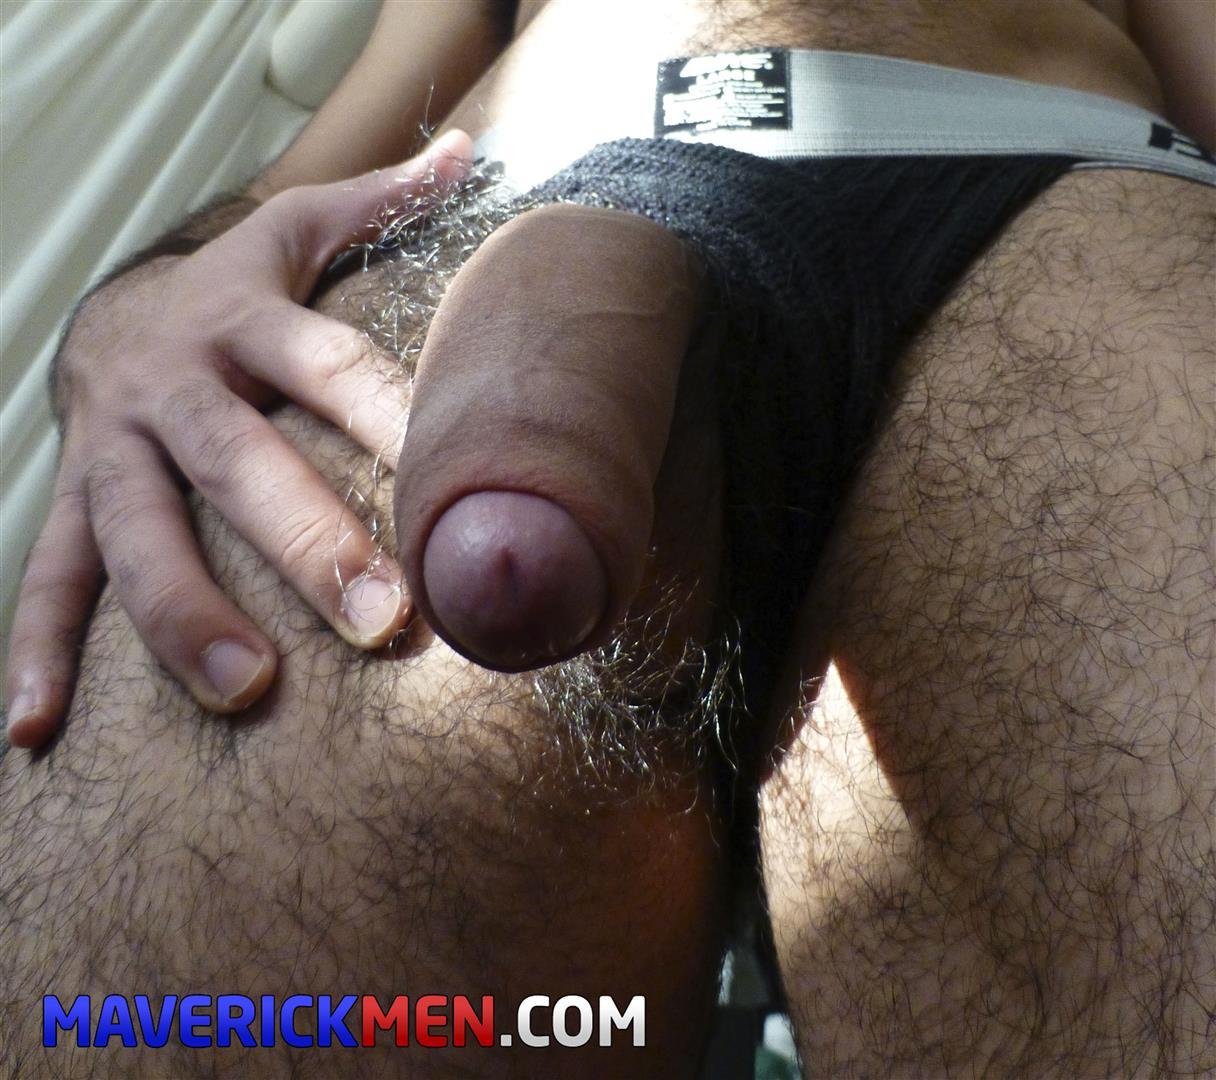 Maverick-Men-Little-Wolf-Hairy-Ass-Guy-With-A-Big-Uncut-Cock-Bareback-Amateur-Gay-Porn-01 Breeding A Young Guy With A Hairy Ass And A Big Uncut Cock